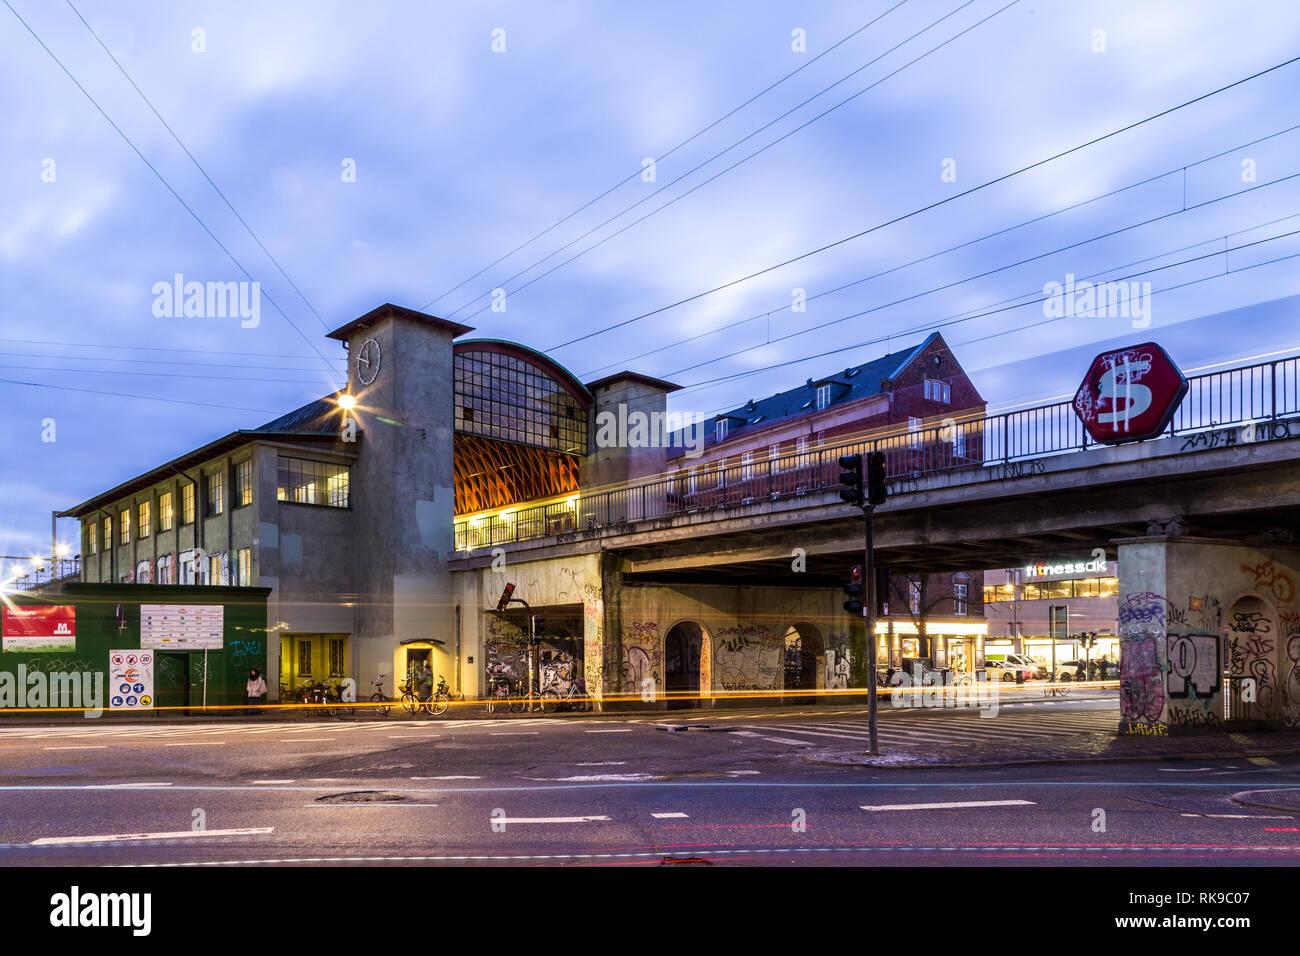 Norrebro Train Station in Copenhagen at night - Stock Image